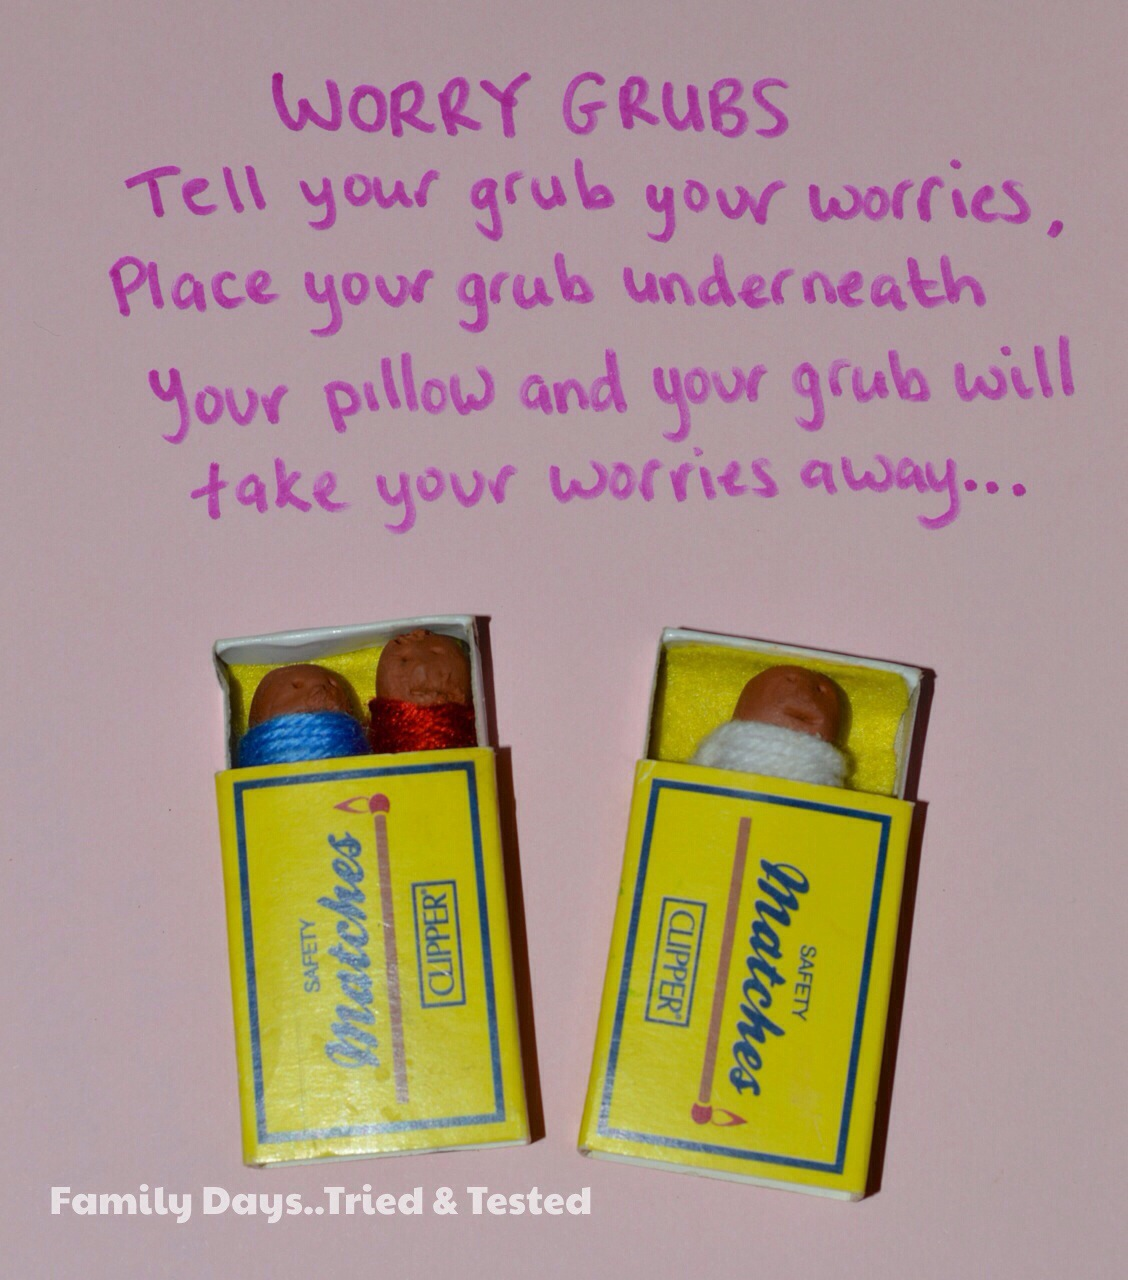 Worry Grubs